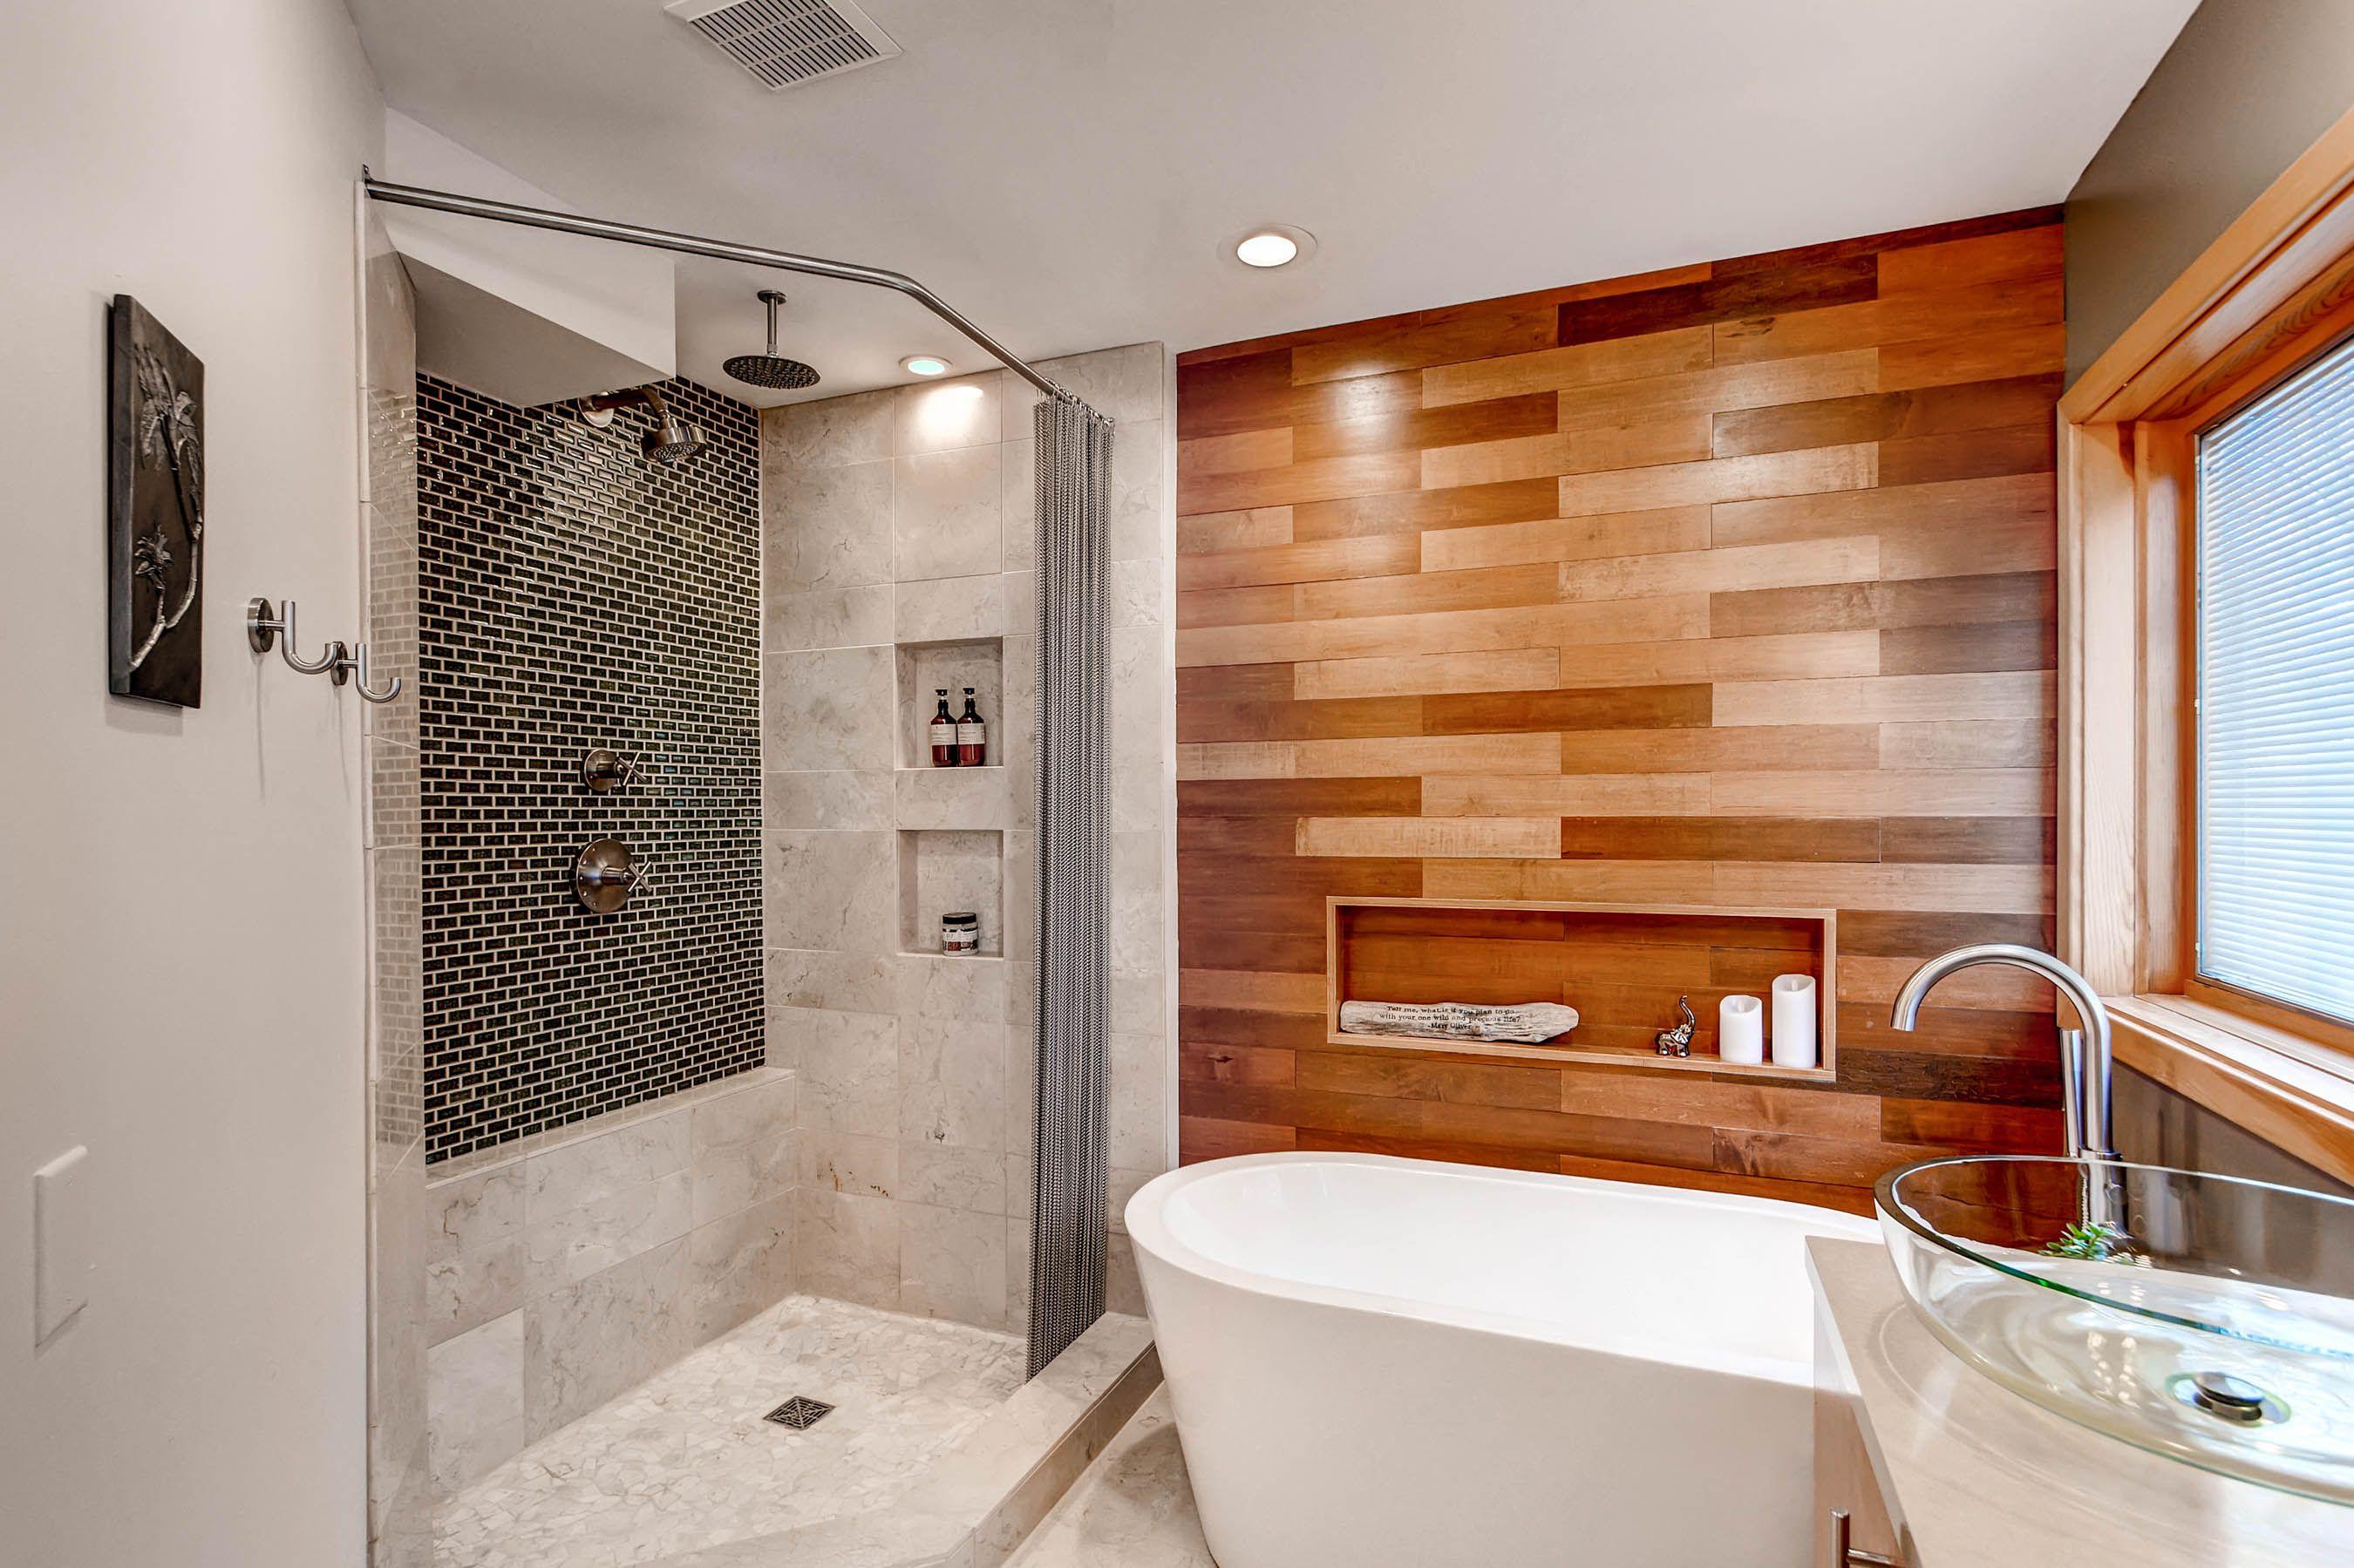 Spa Like Master Bathroom Remodel Bathroom Remodel Cost Rustic